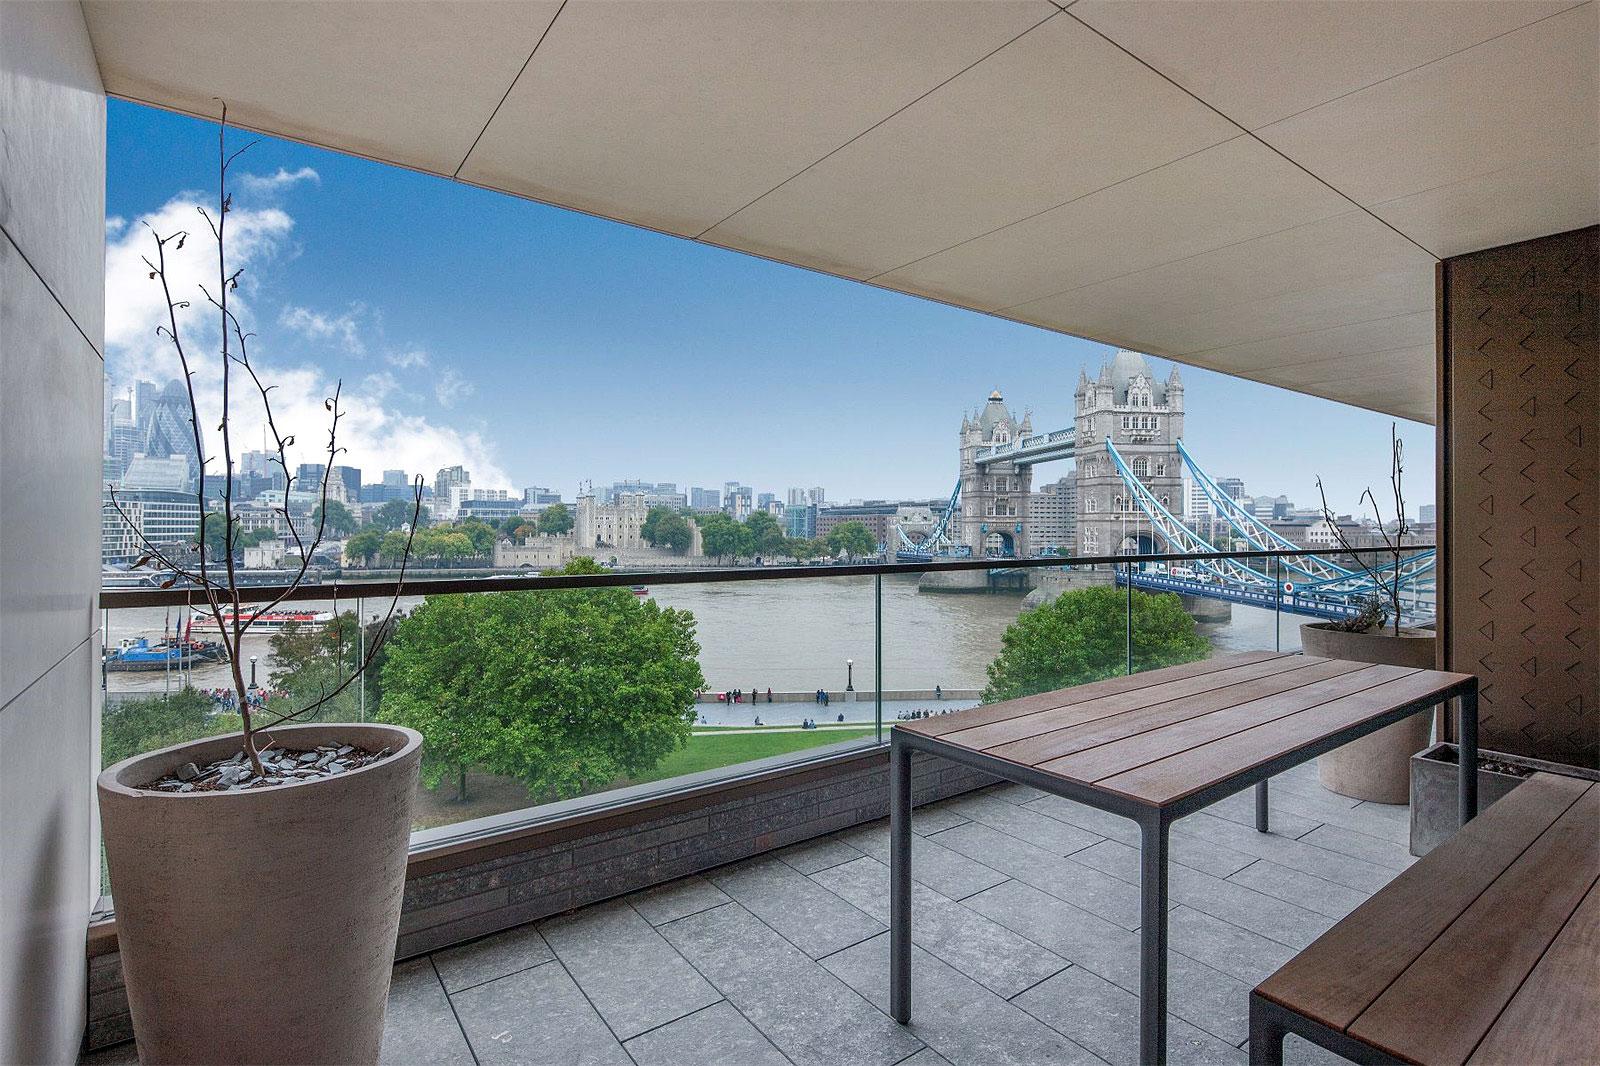 Blenheim House, One Tower Bridge, London, United Kingdom | Shereen Malik, United Kingdom Sotheby's International Realty |FINEST RESIDENCES - 6